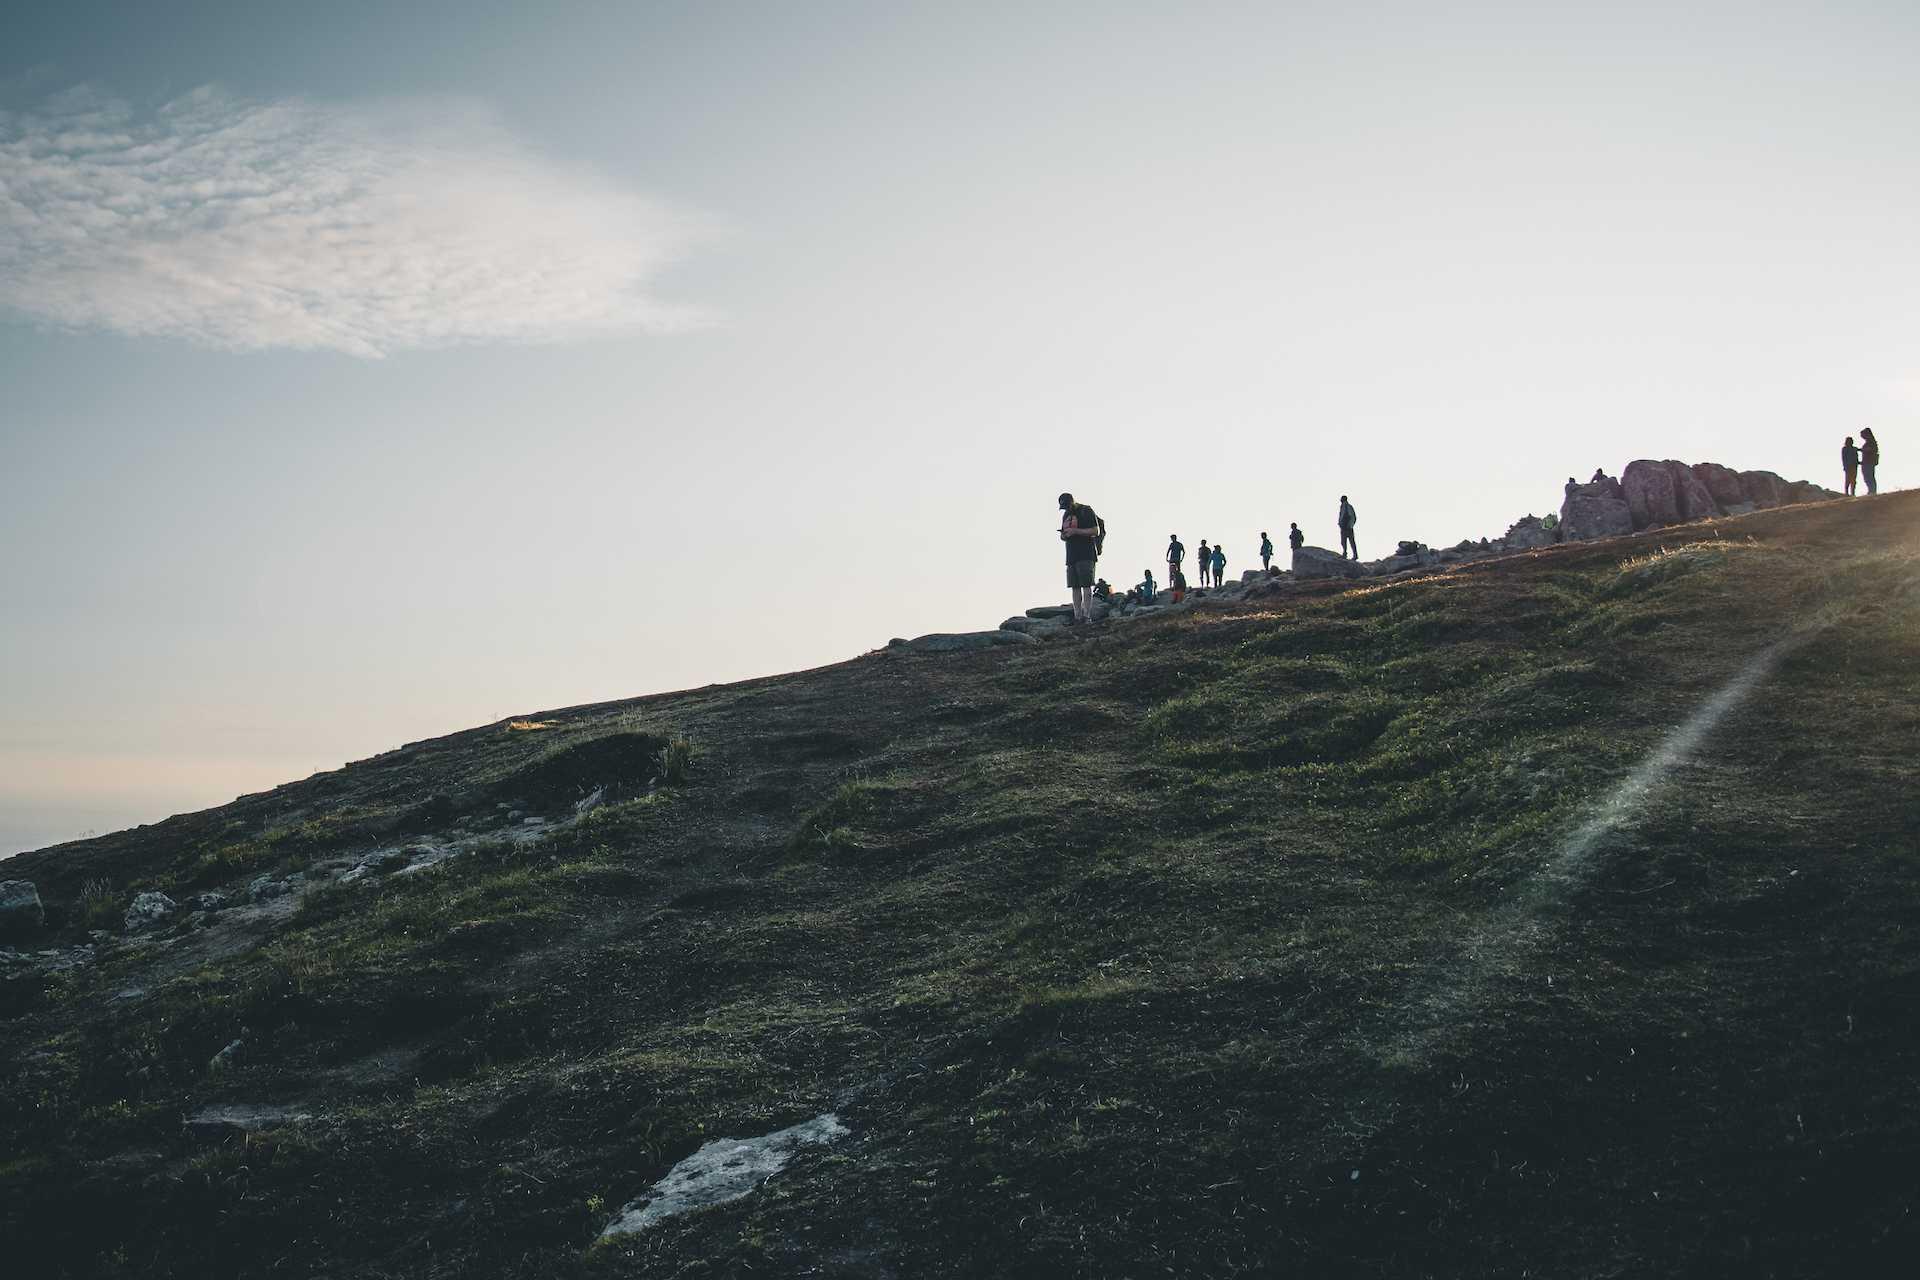 Ryten trekking